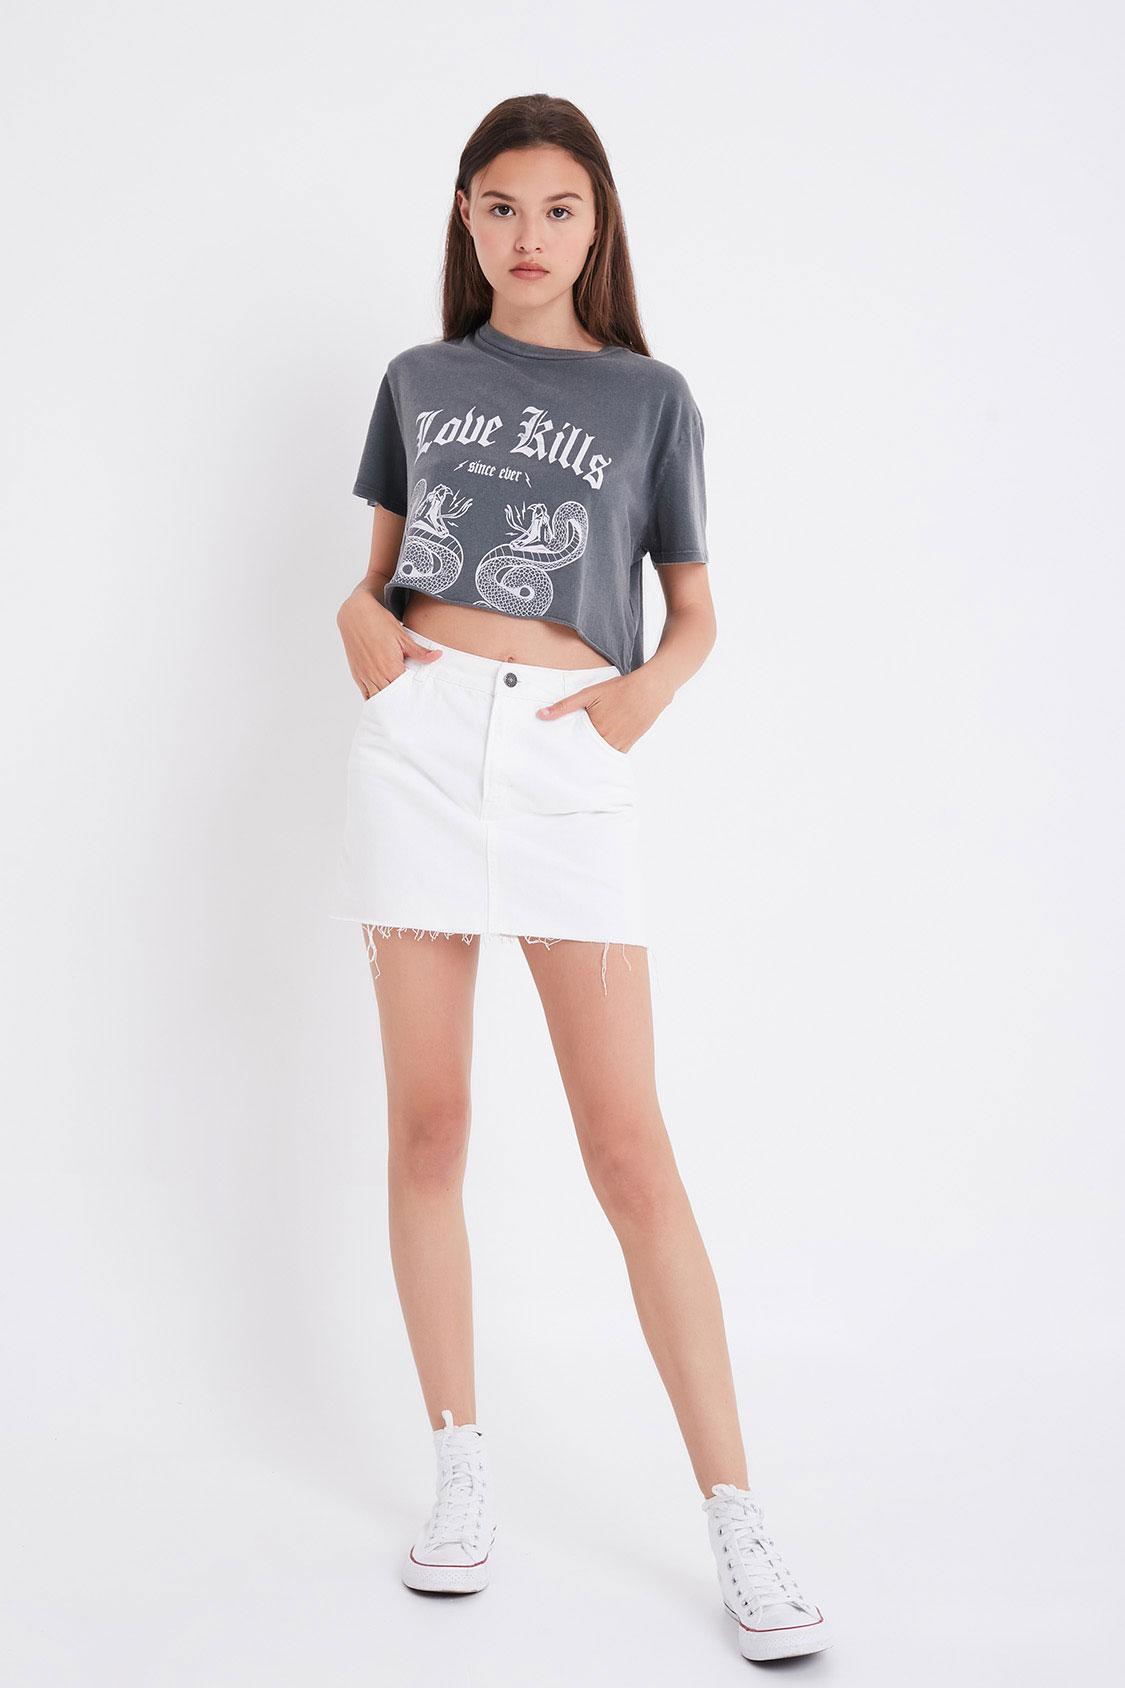 Love Kills printed t-shirt